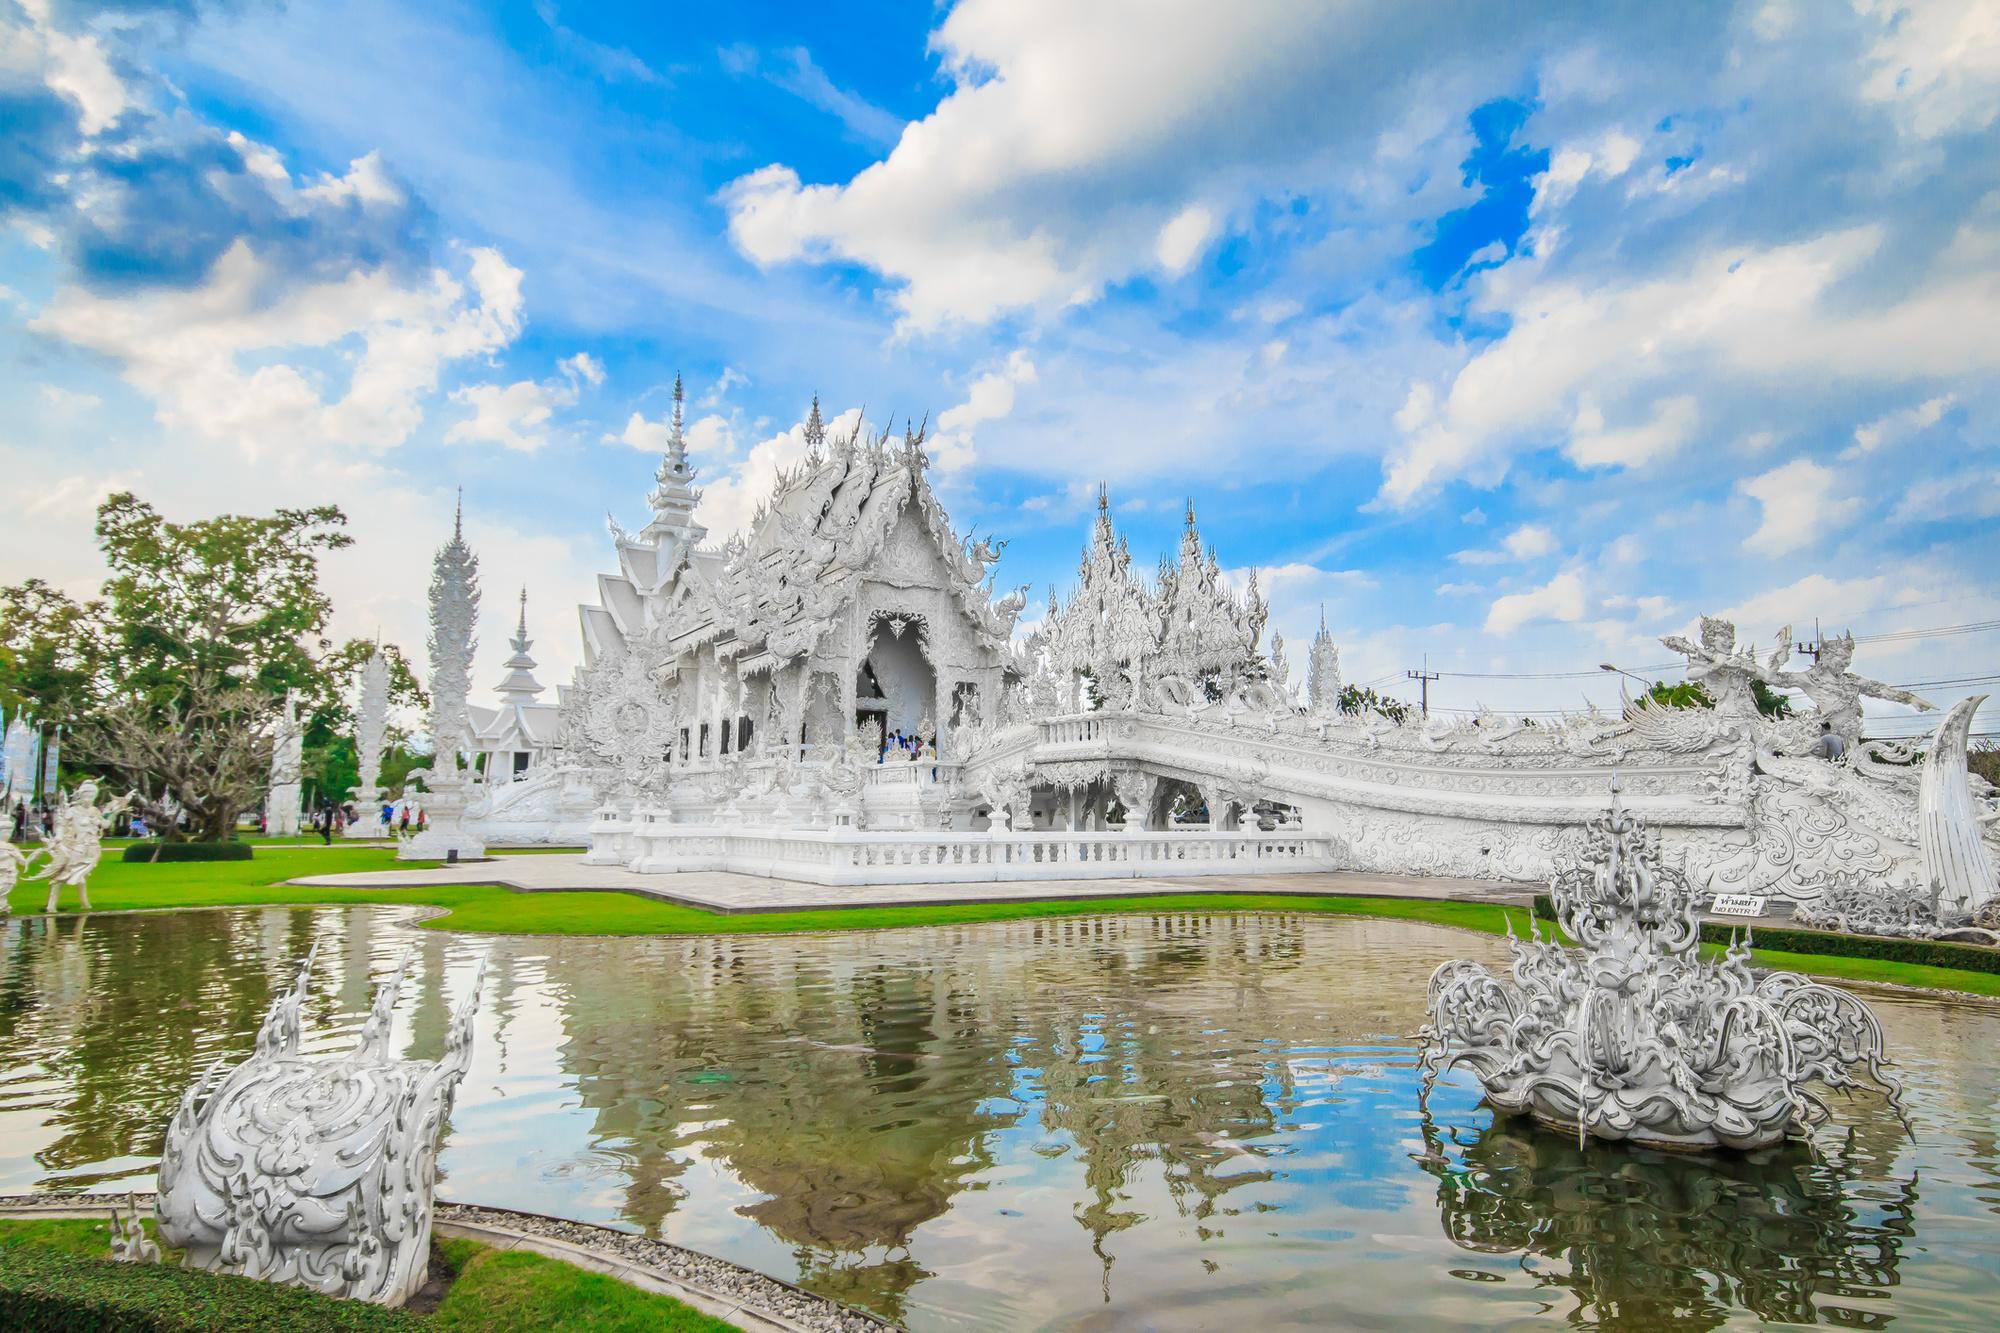 Chiang Rai, Getty Images